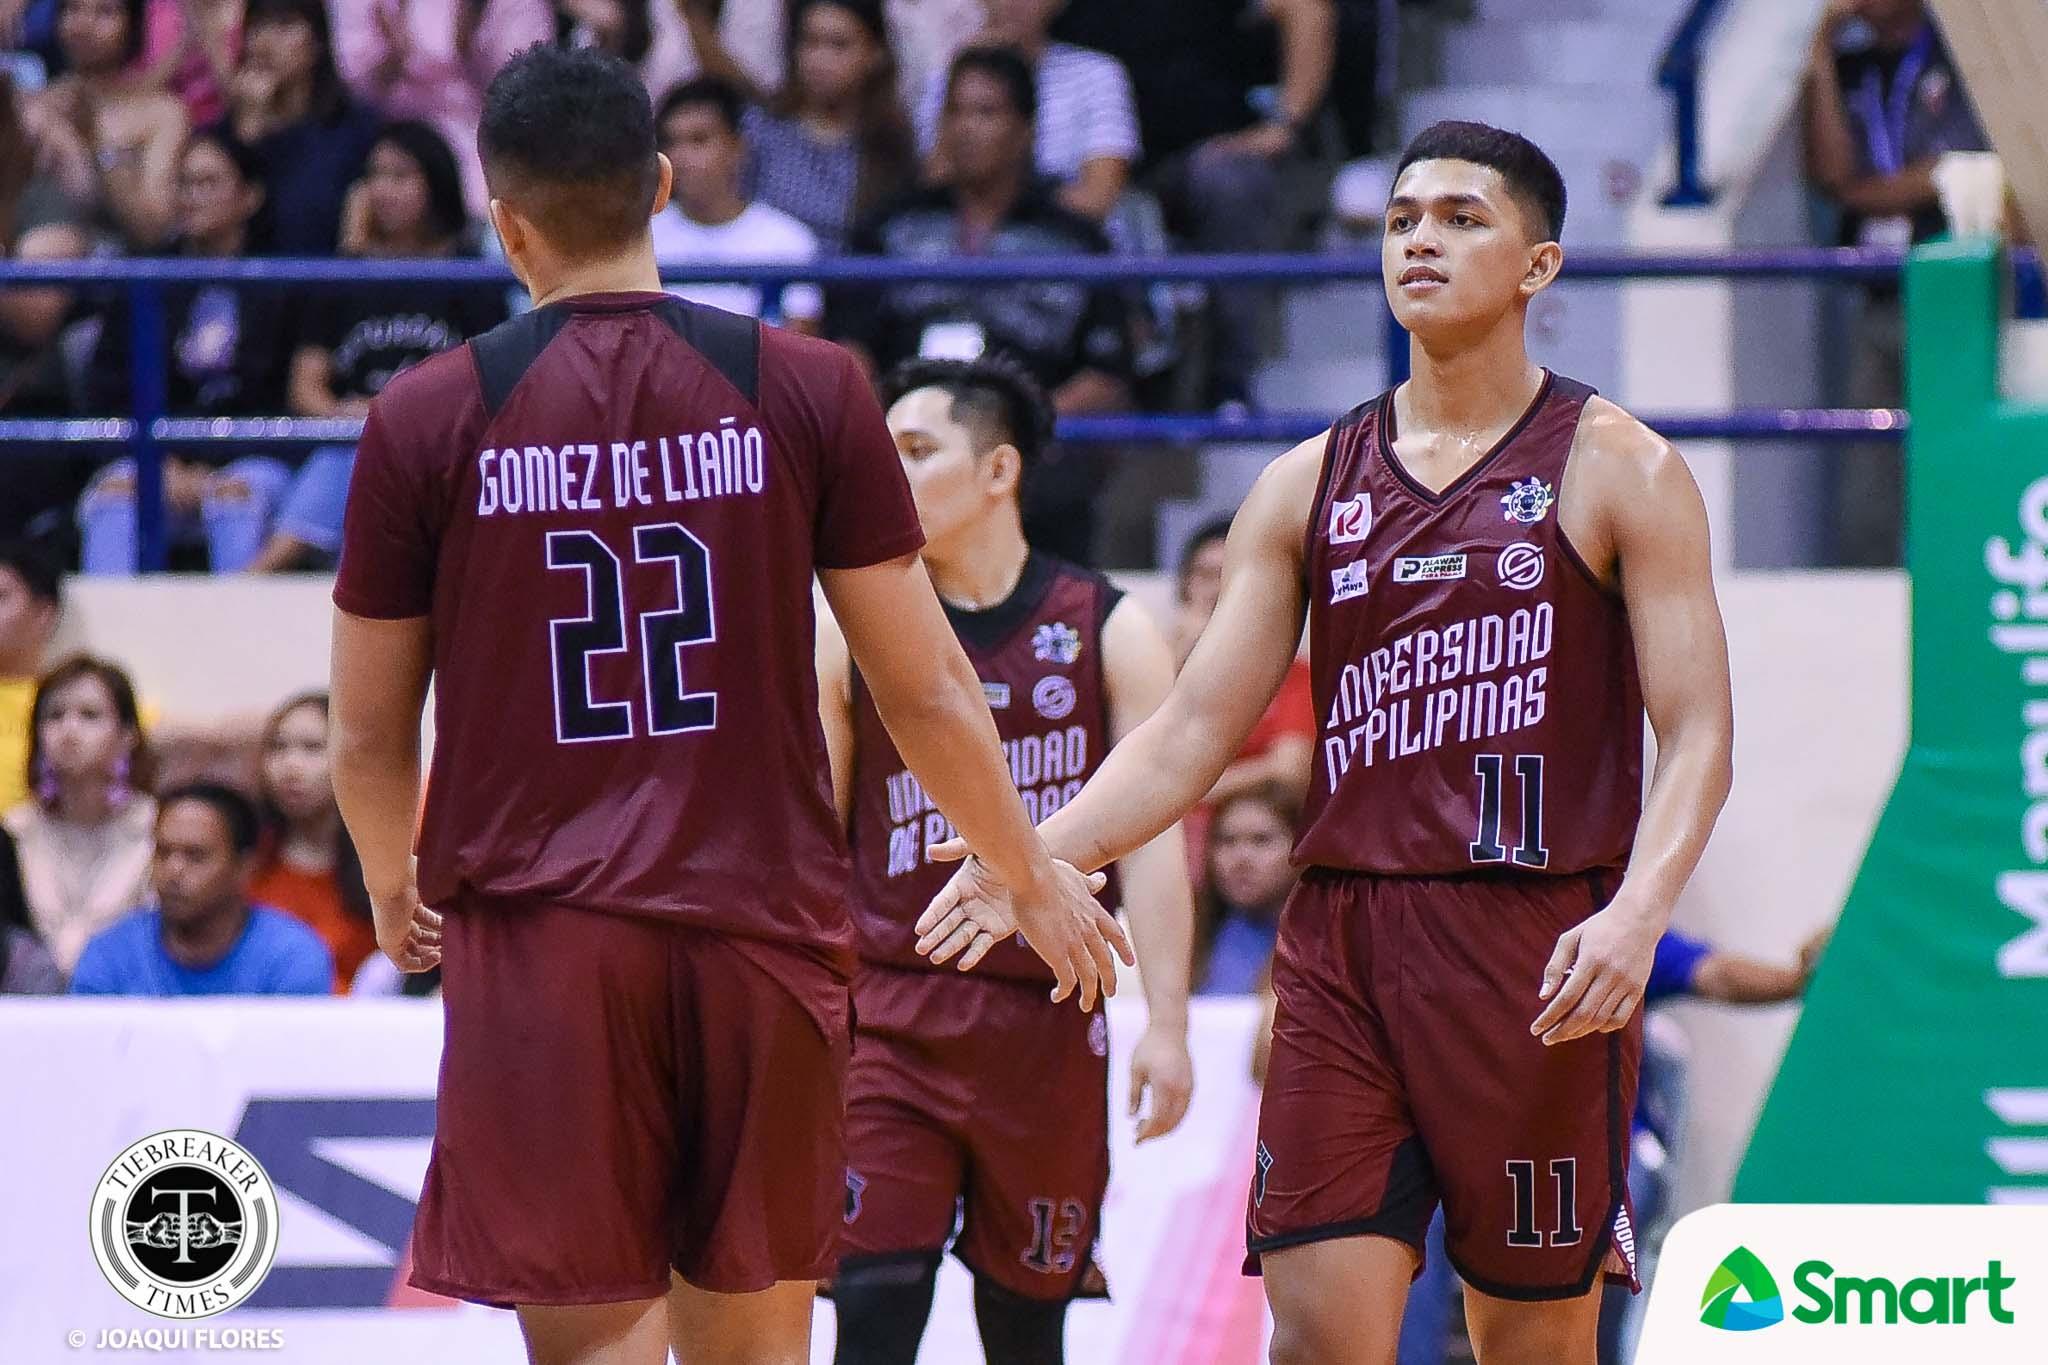 UAAP-82-Mens-Basketball-UP-vs.-UE-Tungcab-8935 Jaydee Tungcab applies for PBA Draft as B.League dream crushed by COVID-19 Basketball News PBA  - philippine sports news